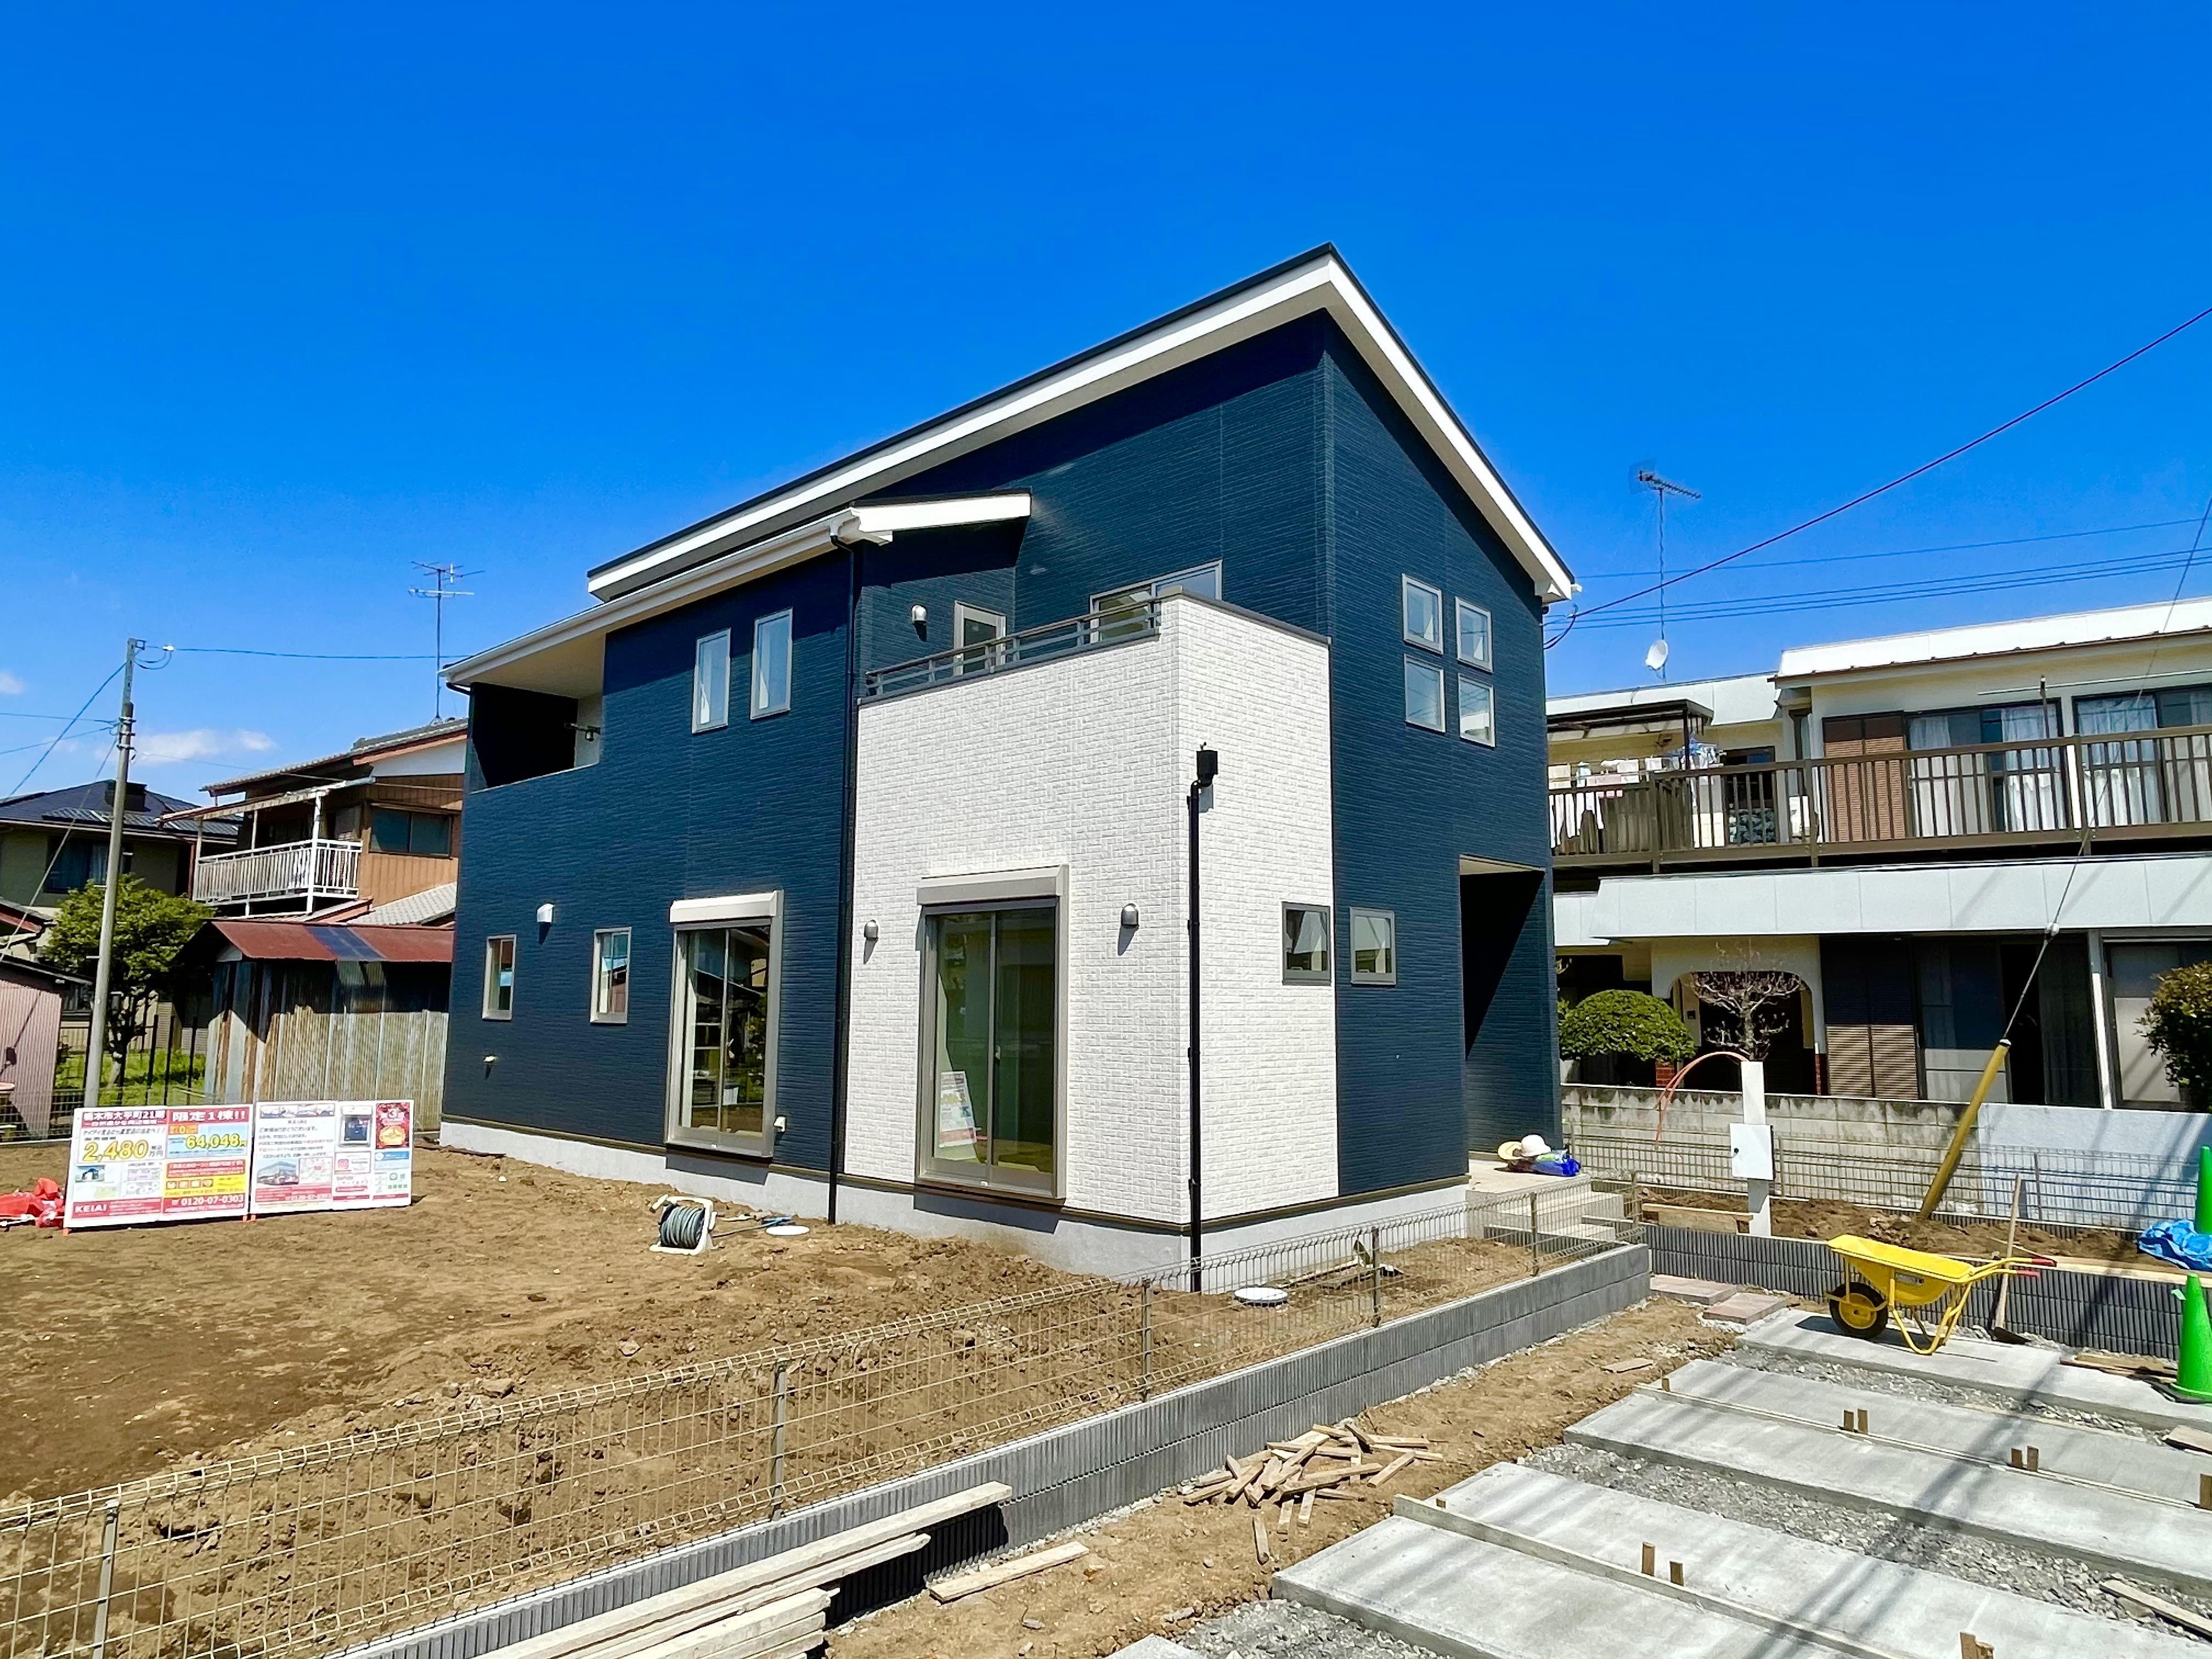 【KEIAI】 -Ricca- 栃木市大平町21期 1号棟